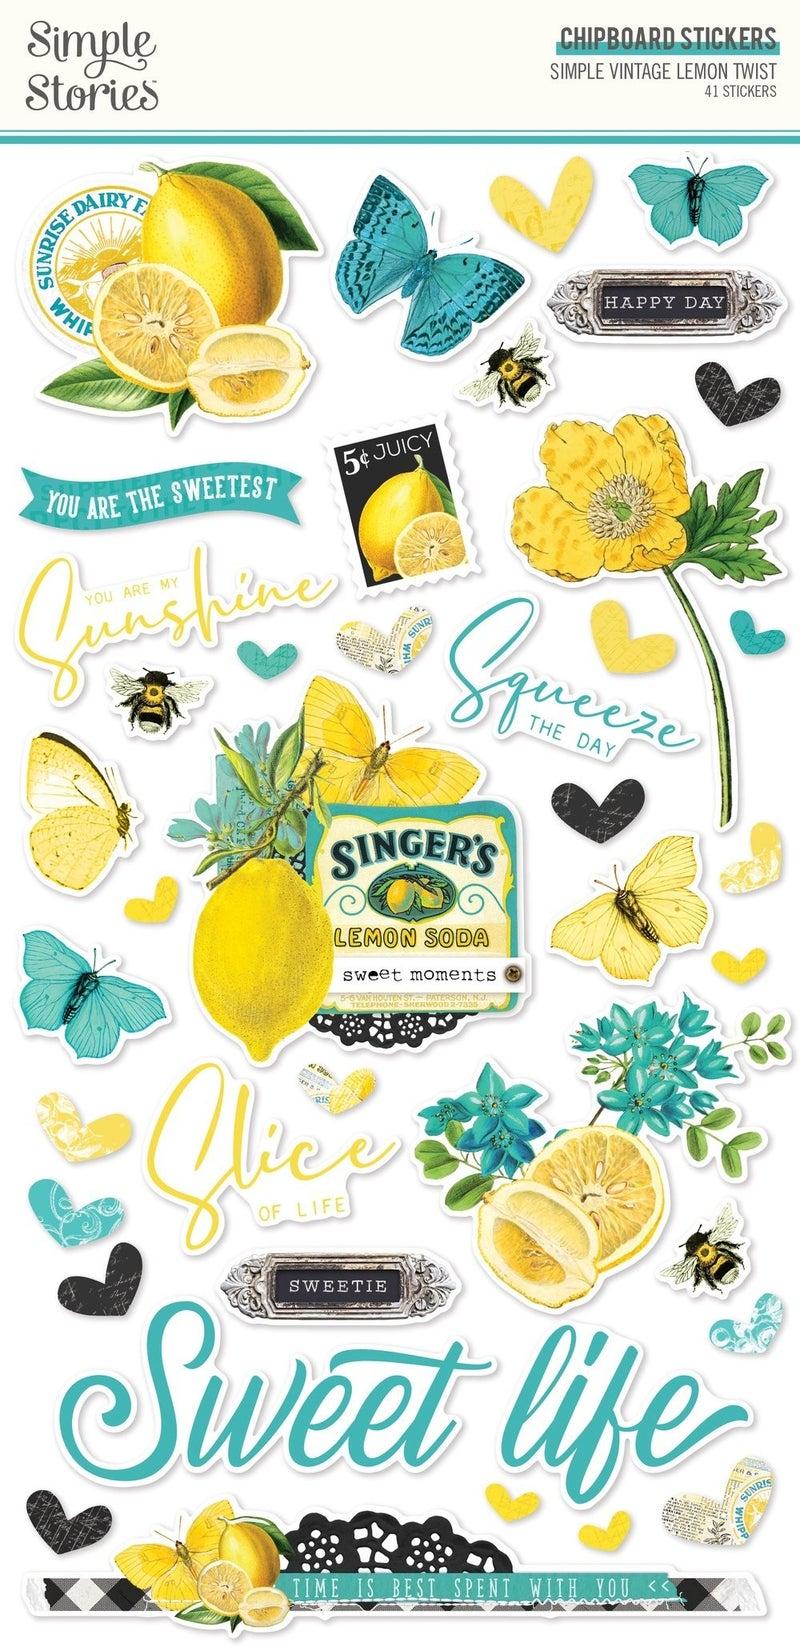 Simple Vintage Lemon Twist Chipboard Stickers